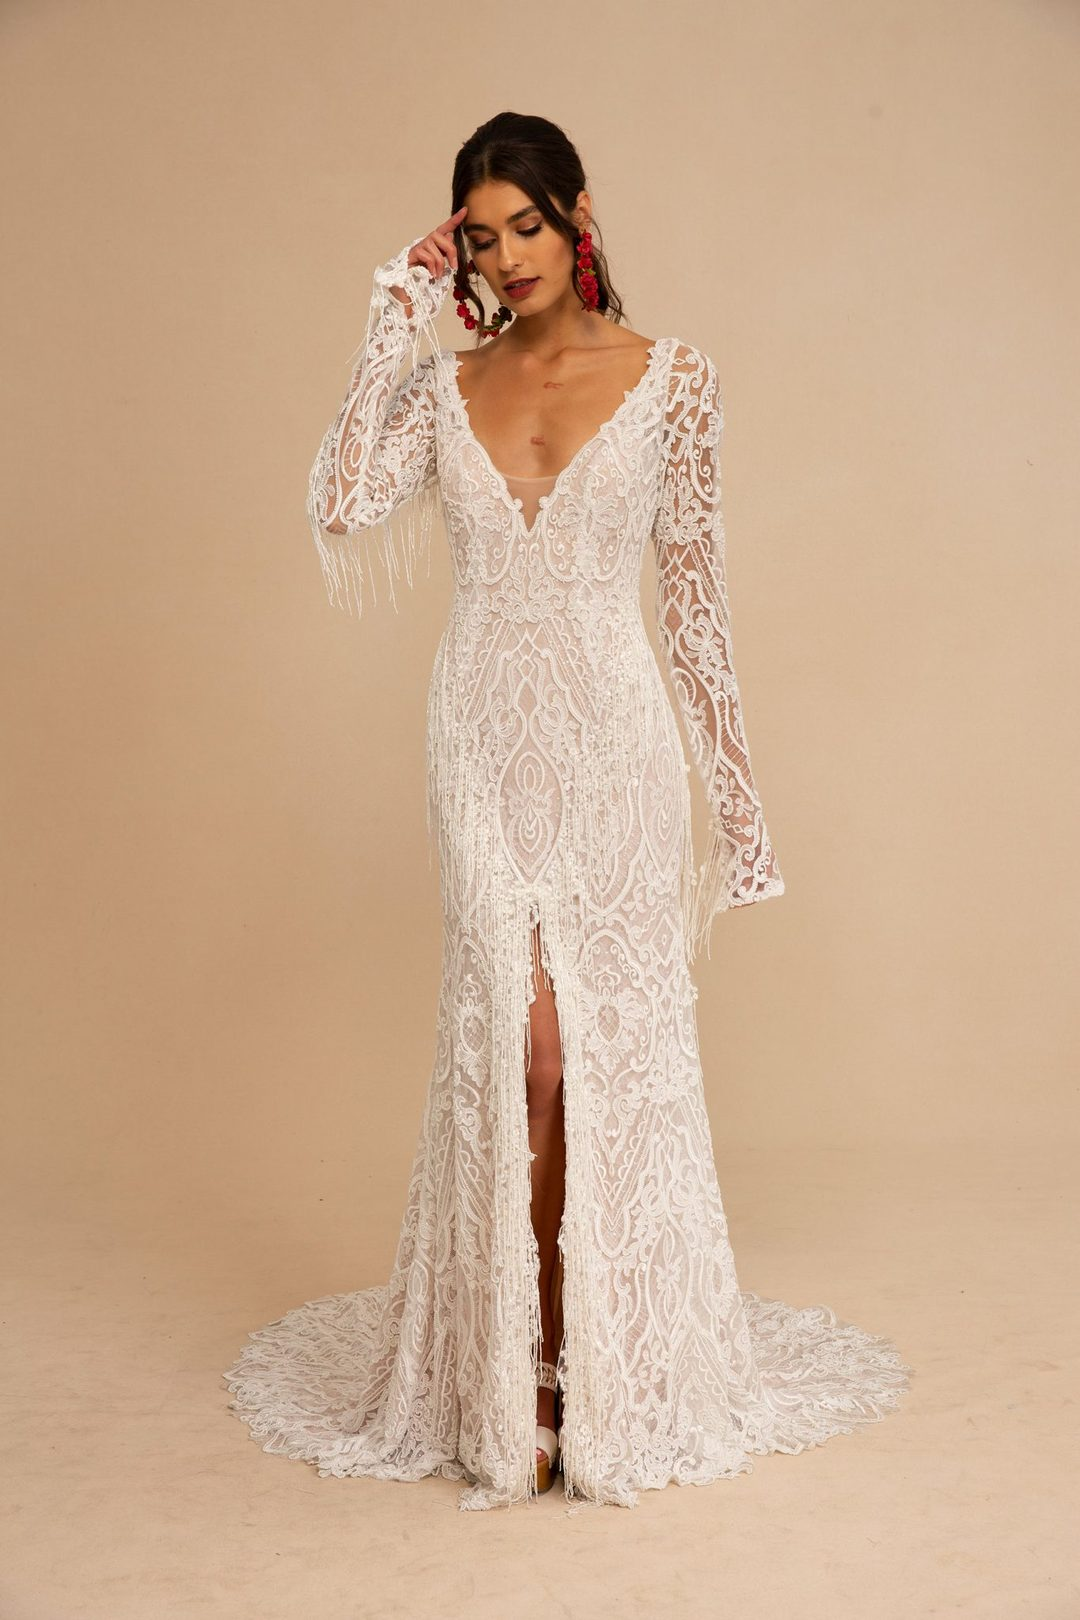 Dress main 2x 1548938750